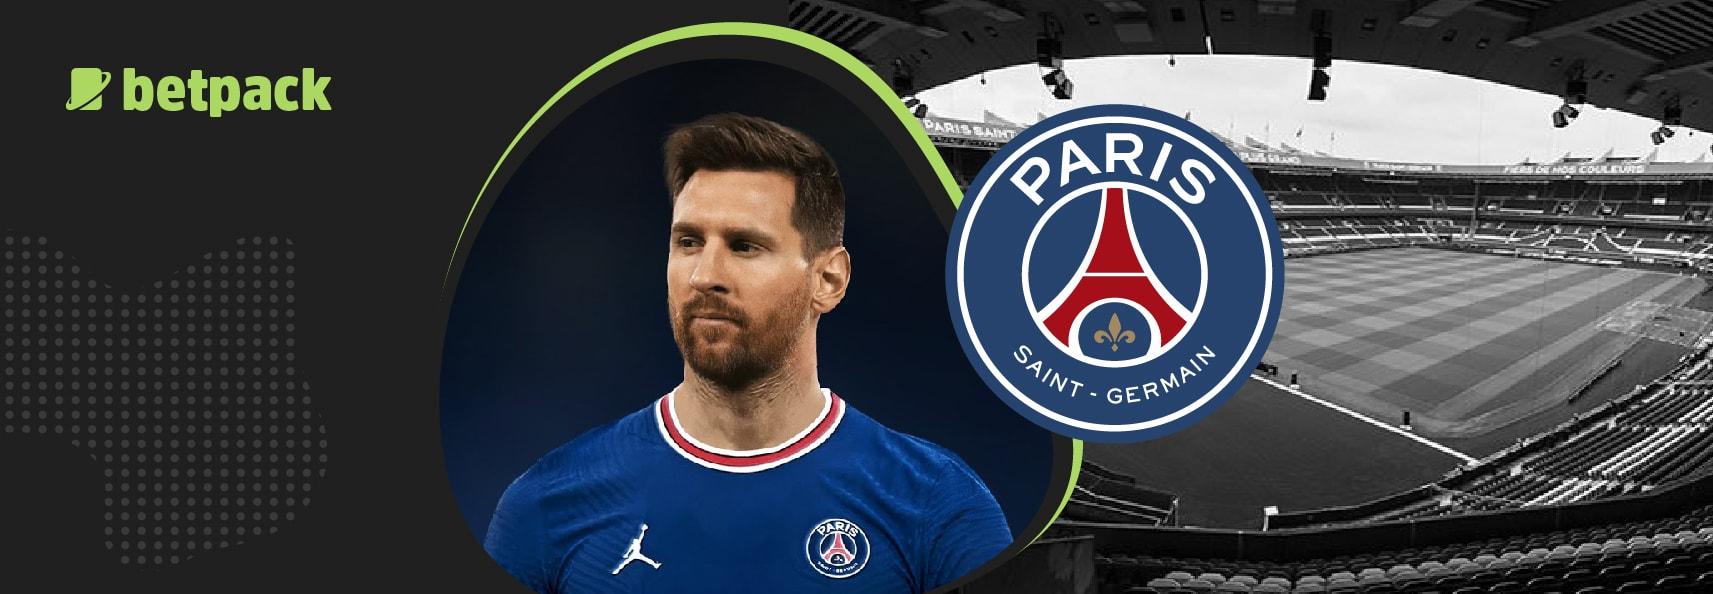 Transfer saga ends, Messi joins PSG